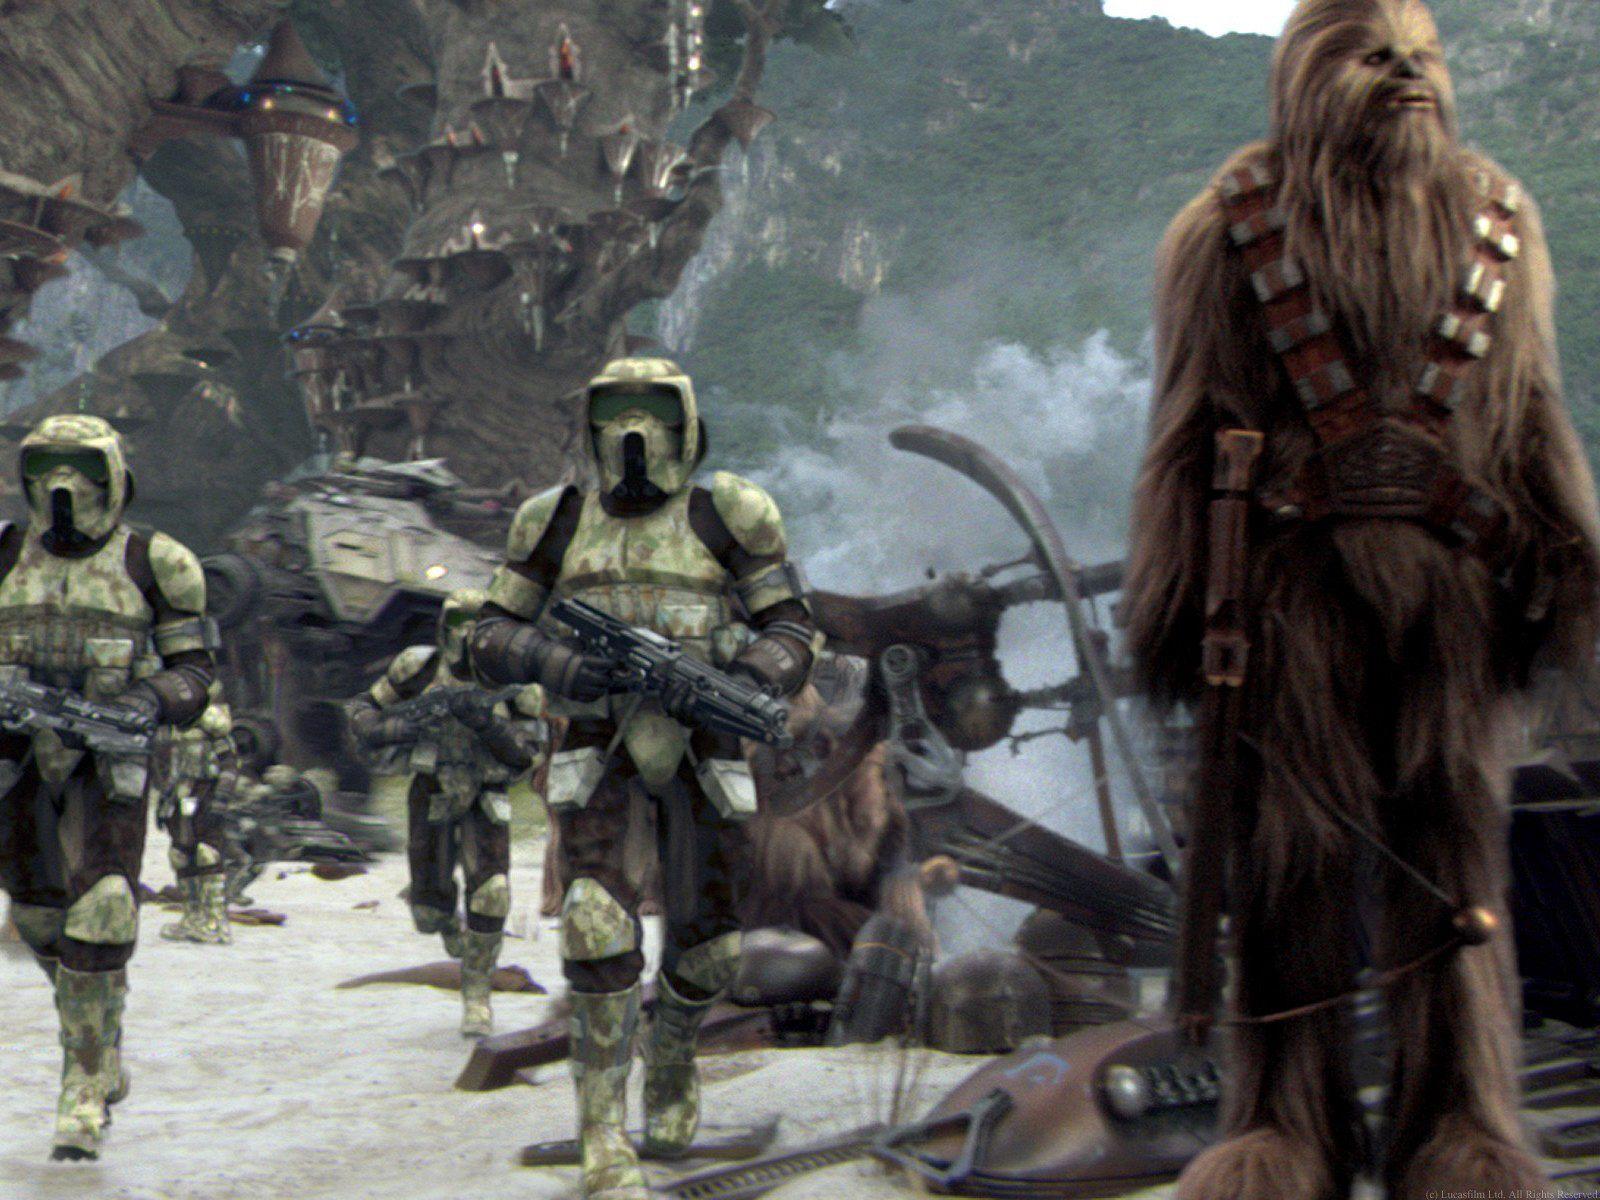 Clone Trooper On Kashyyyk Star Wars 3 The Revenge Of The Sith Star Wars Fine Art Star Wars Images Star Wars Canon